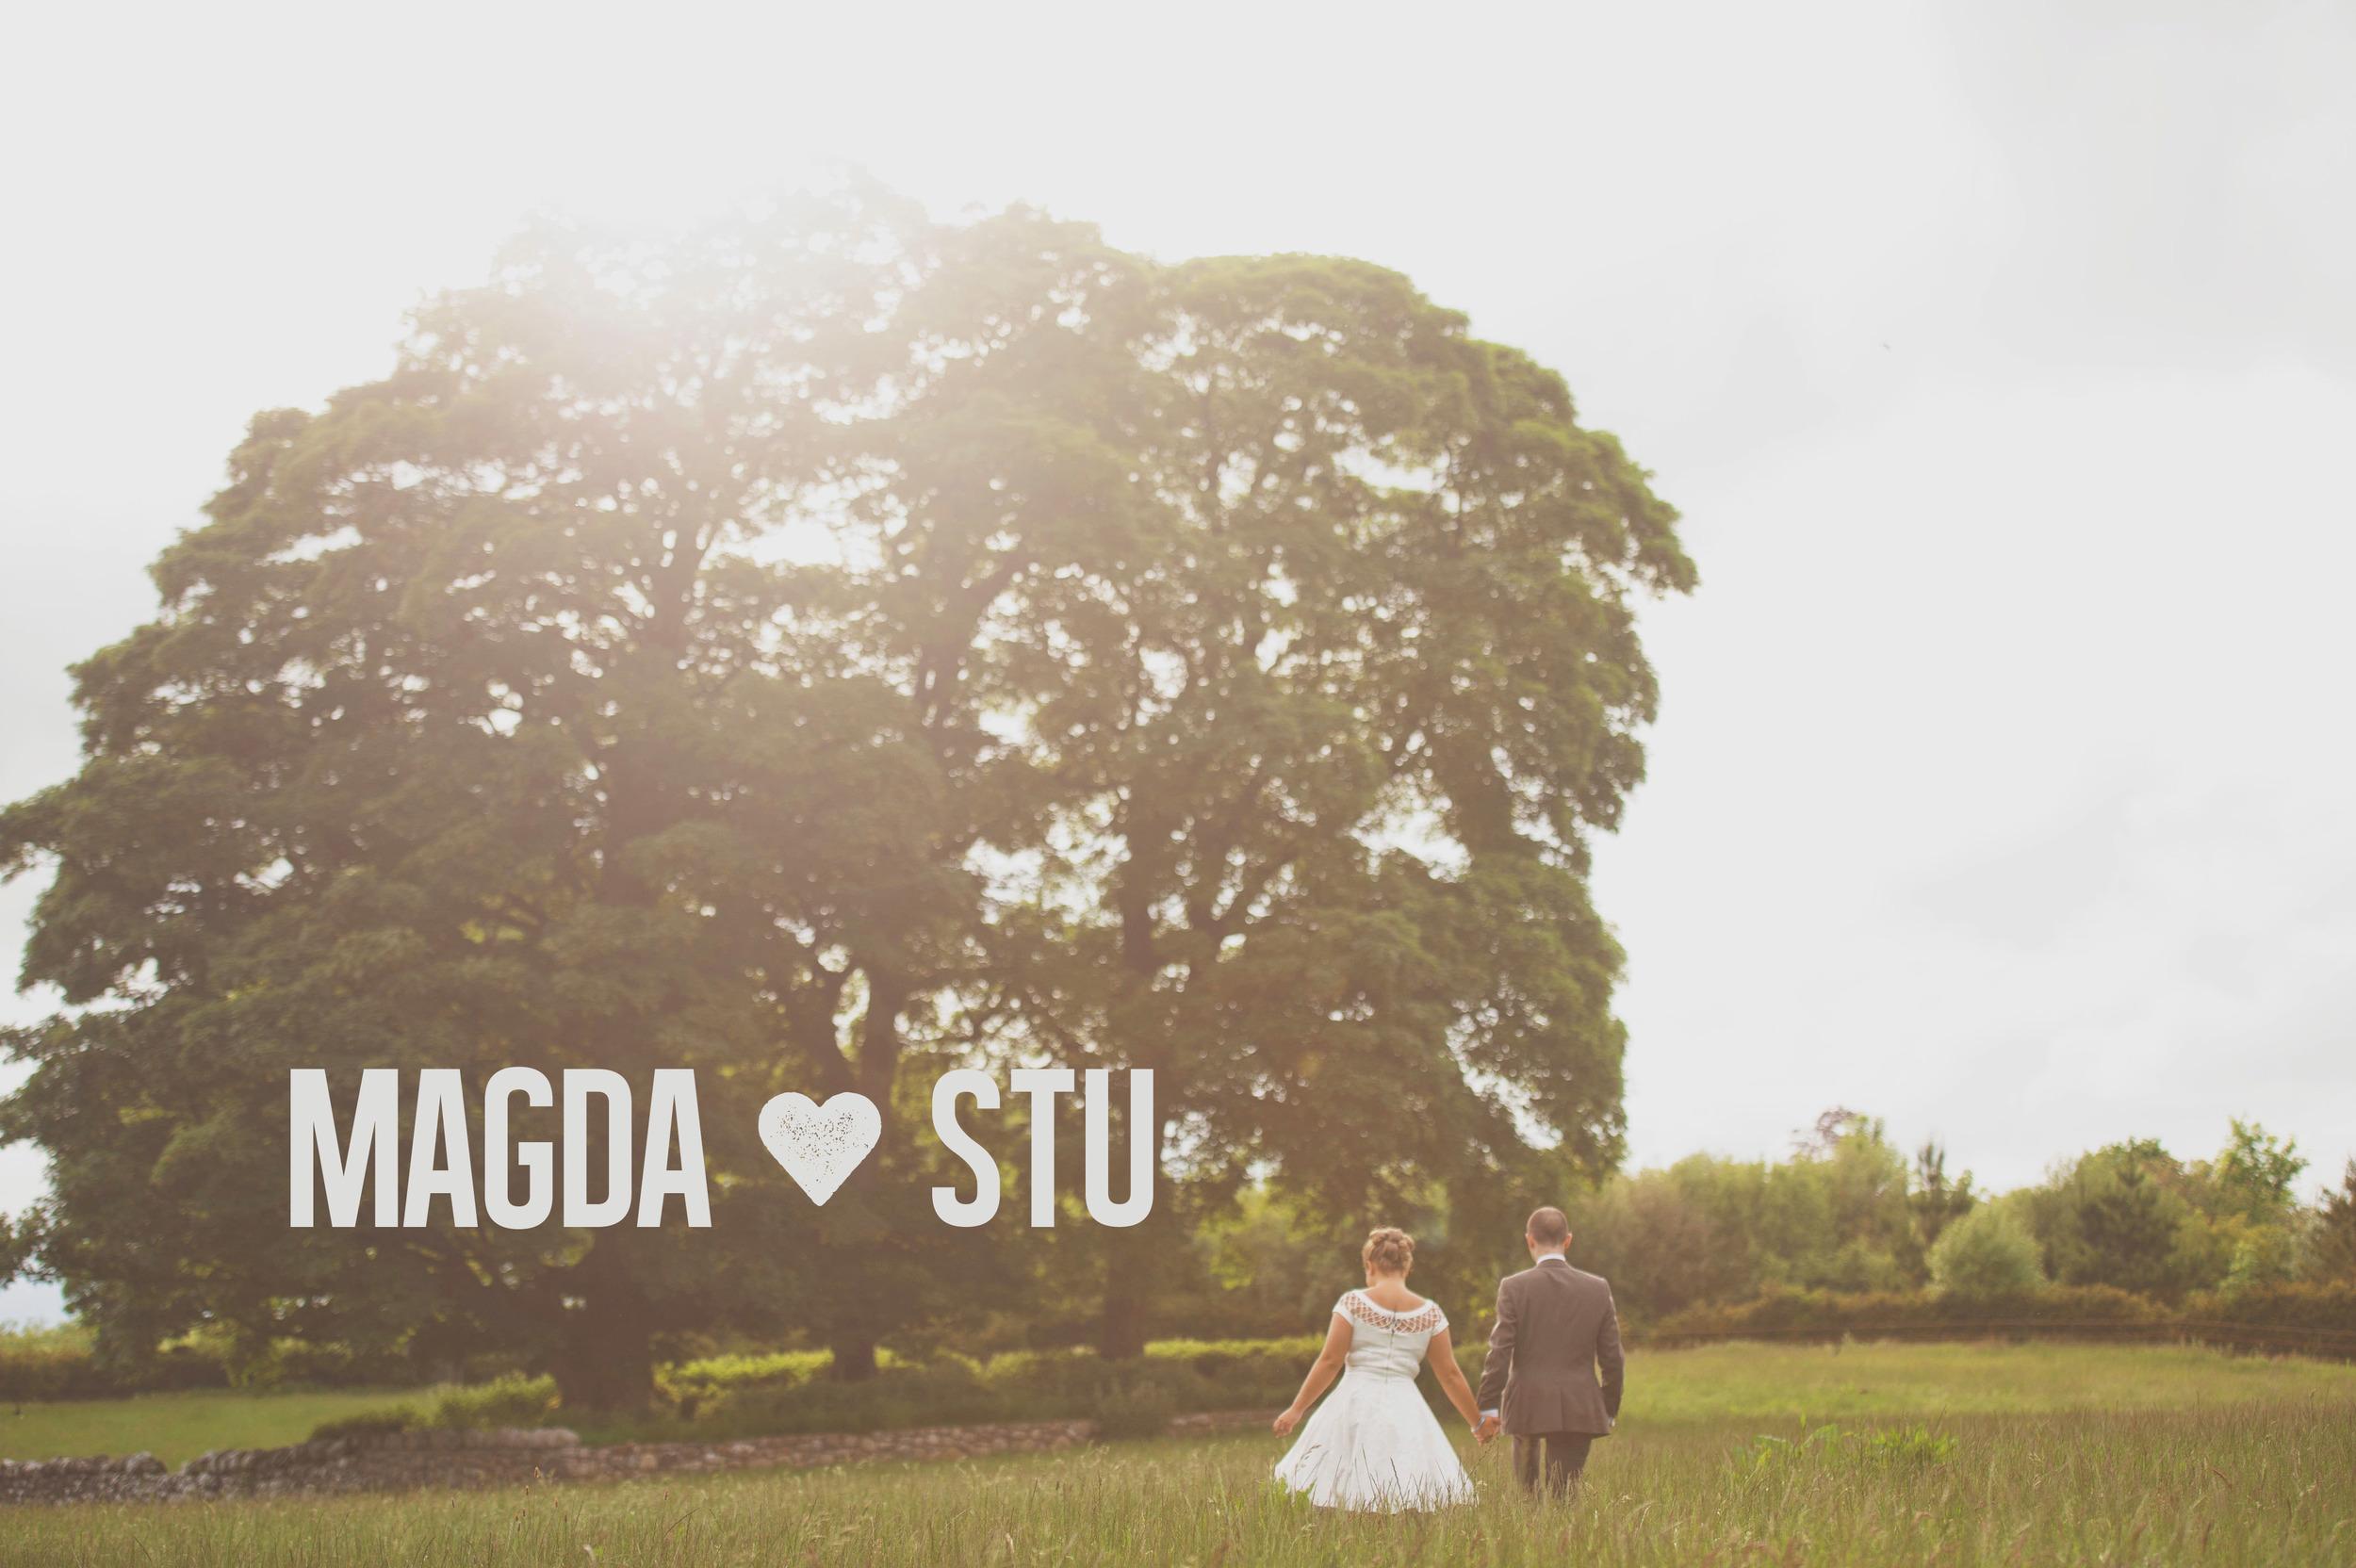 Magda and Stu's Mount Druid Wedding - June 2014